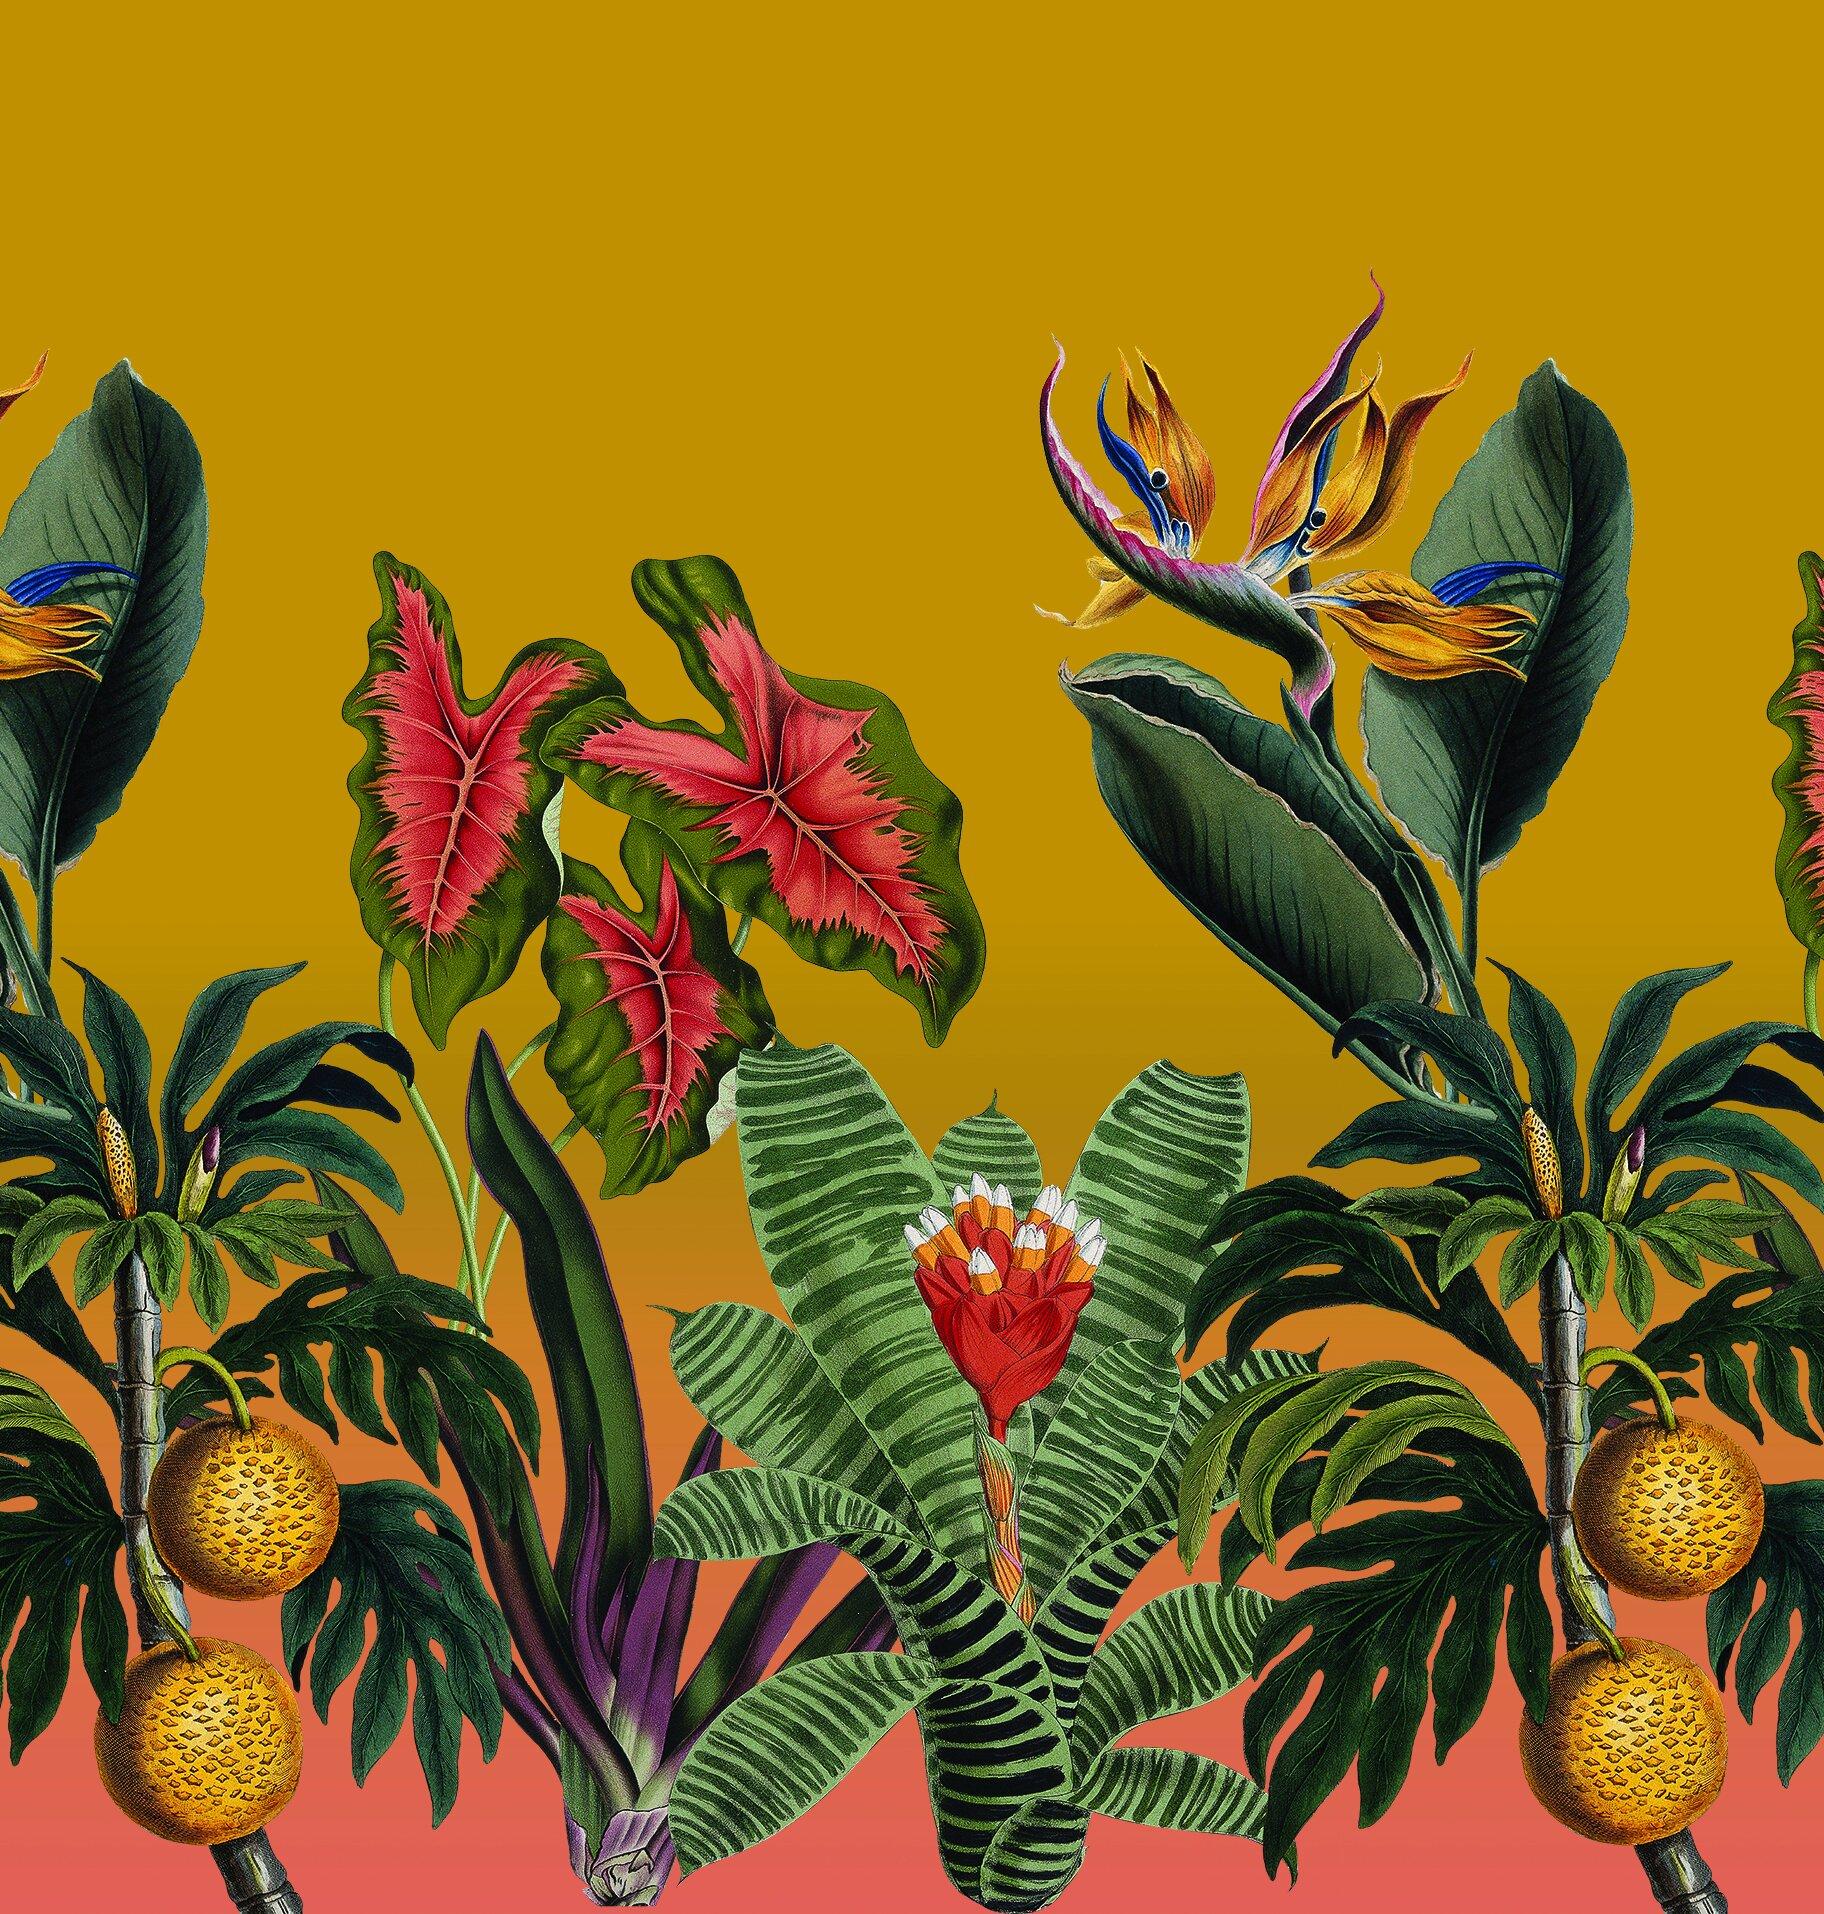 Vintage Botanical Garden Mural Removable Fabric Wallpaper Peel And Stick Samantha Santana